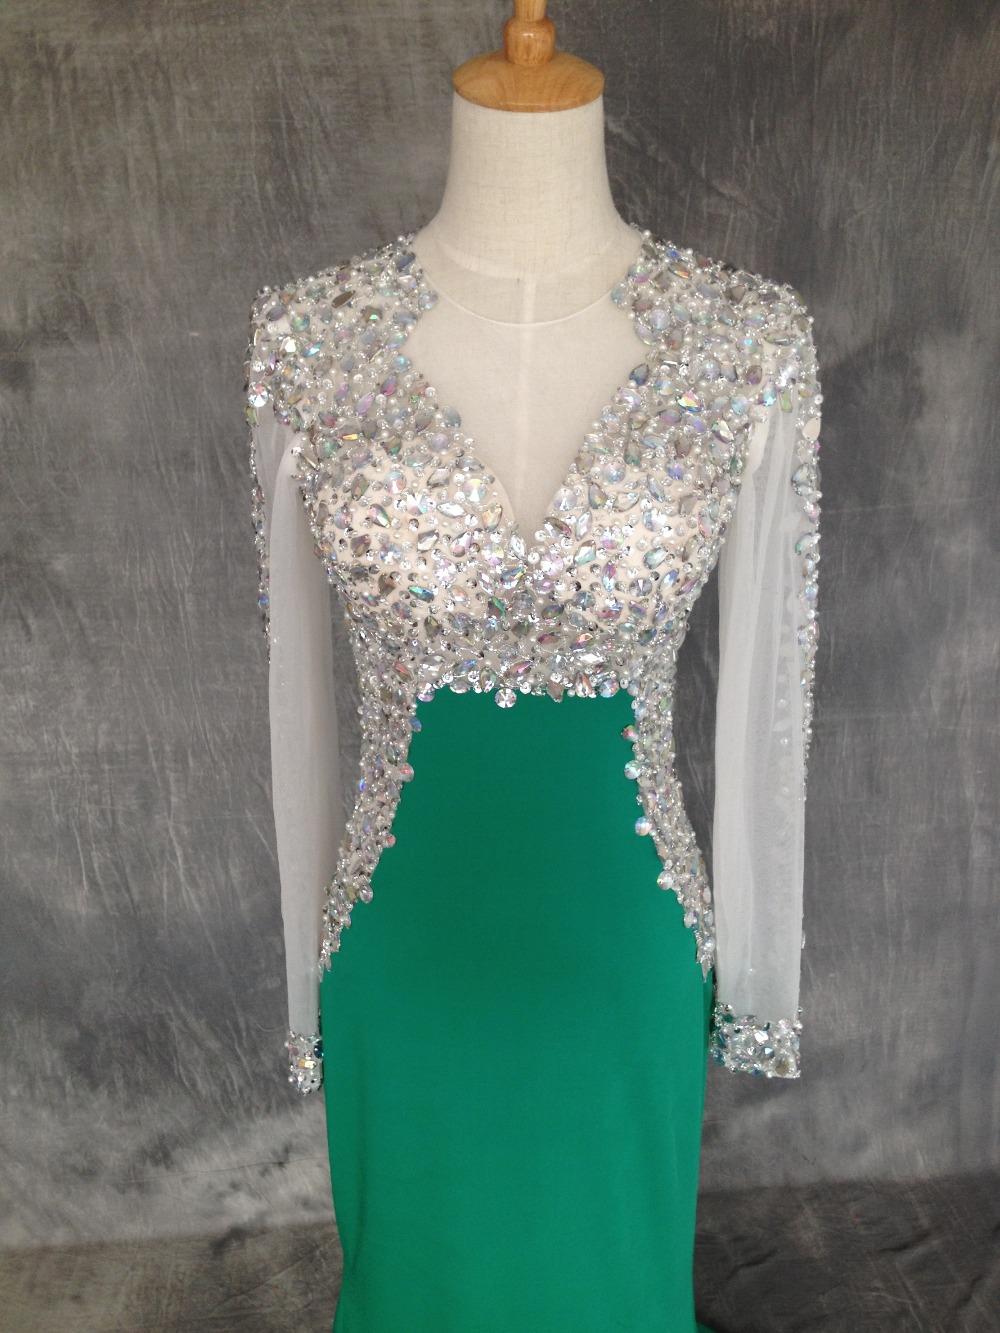 Green vestido de formatura 2015 Diamond Prom Dresses With Long Sleeves Rhinestone Floor Length